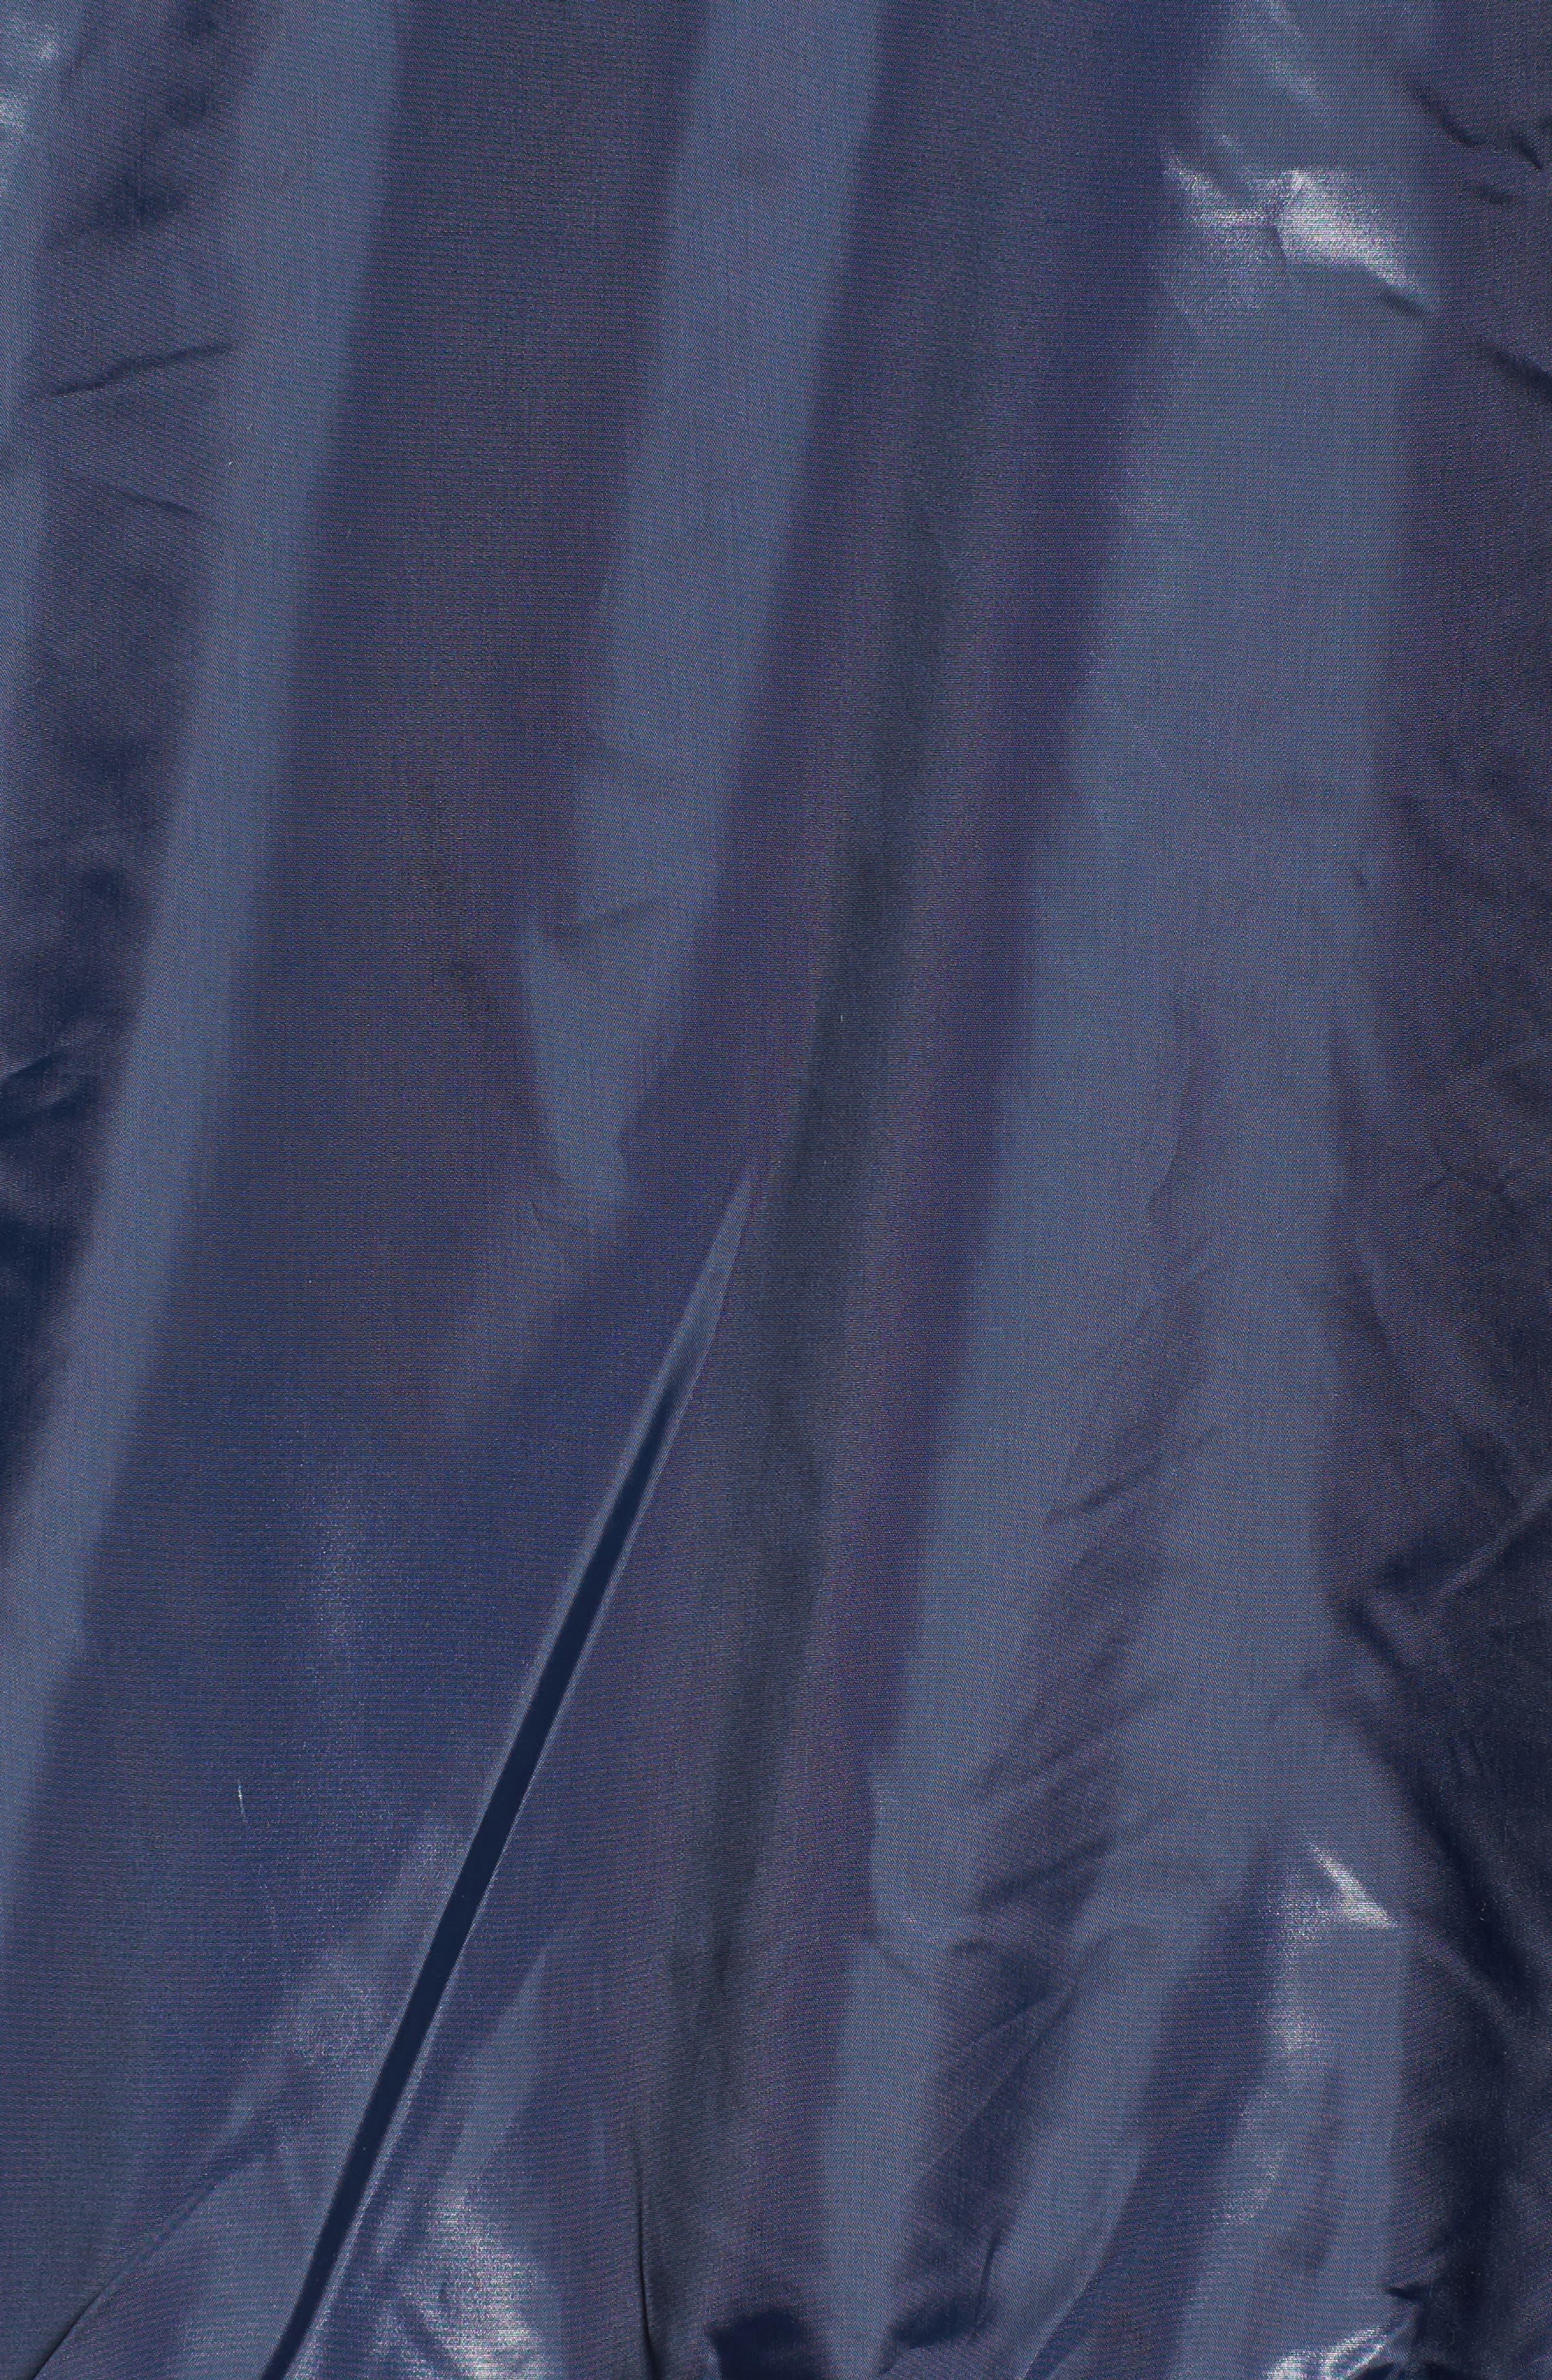 Wetlook Hooded Pullover,                             Alternate thumbnail 7, color,                             400